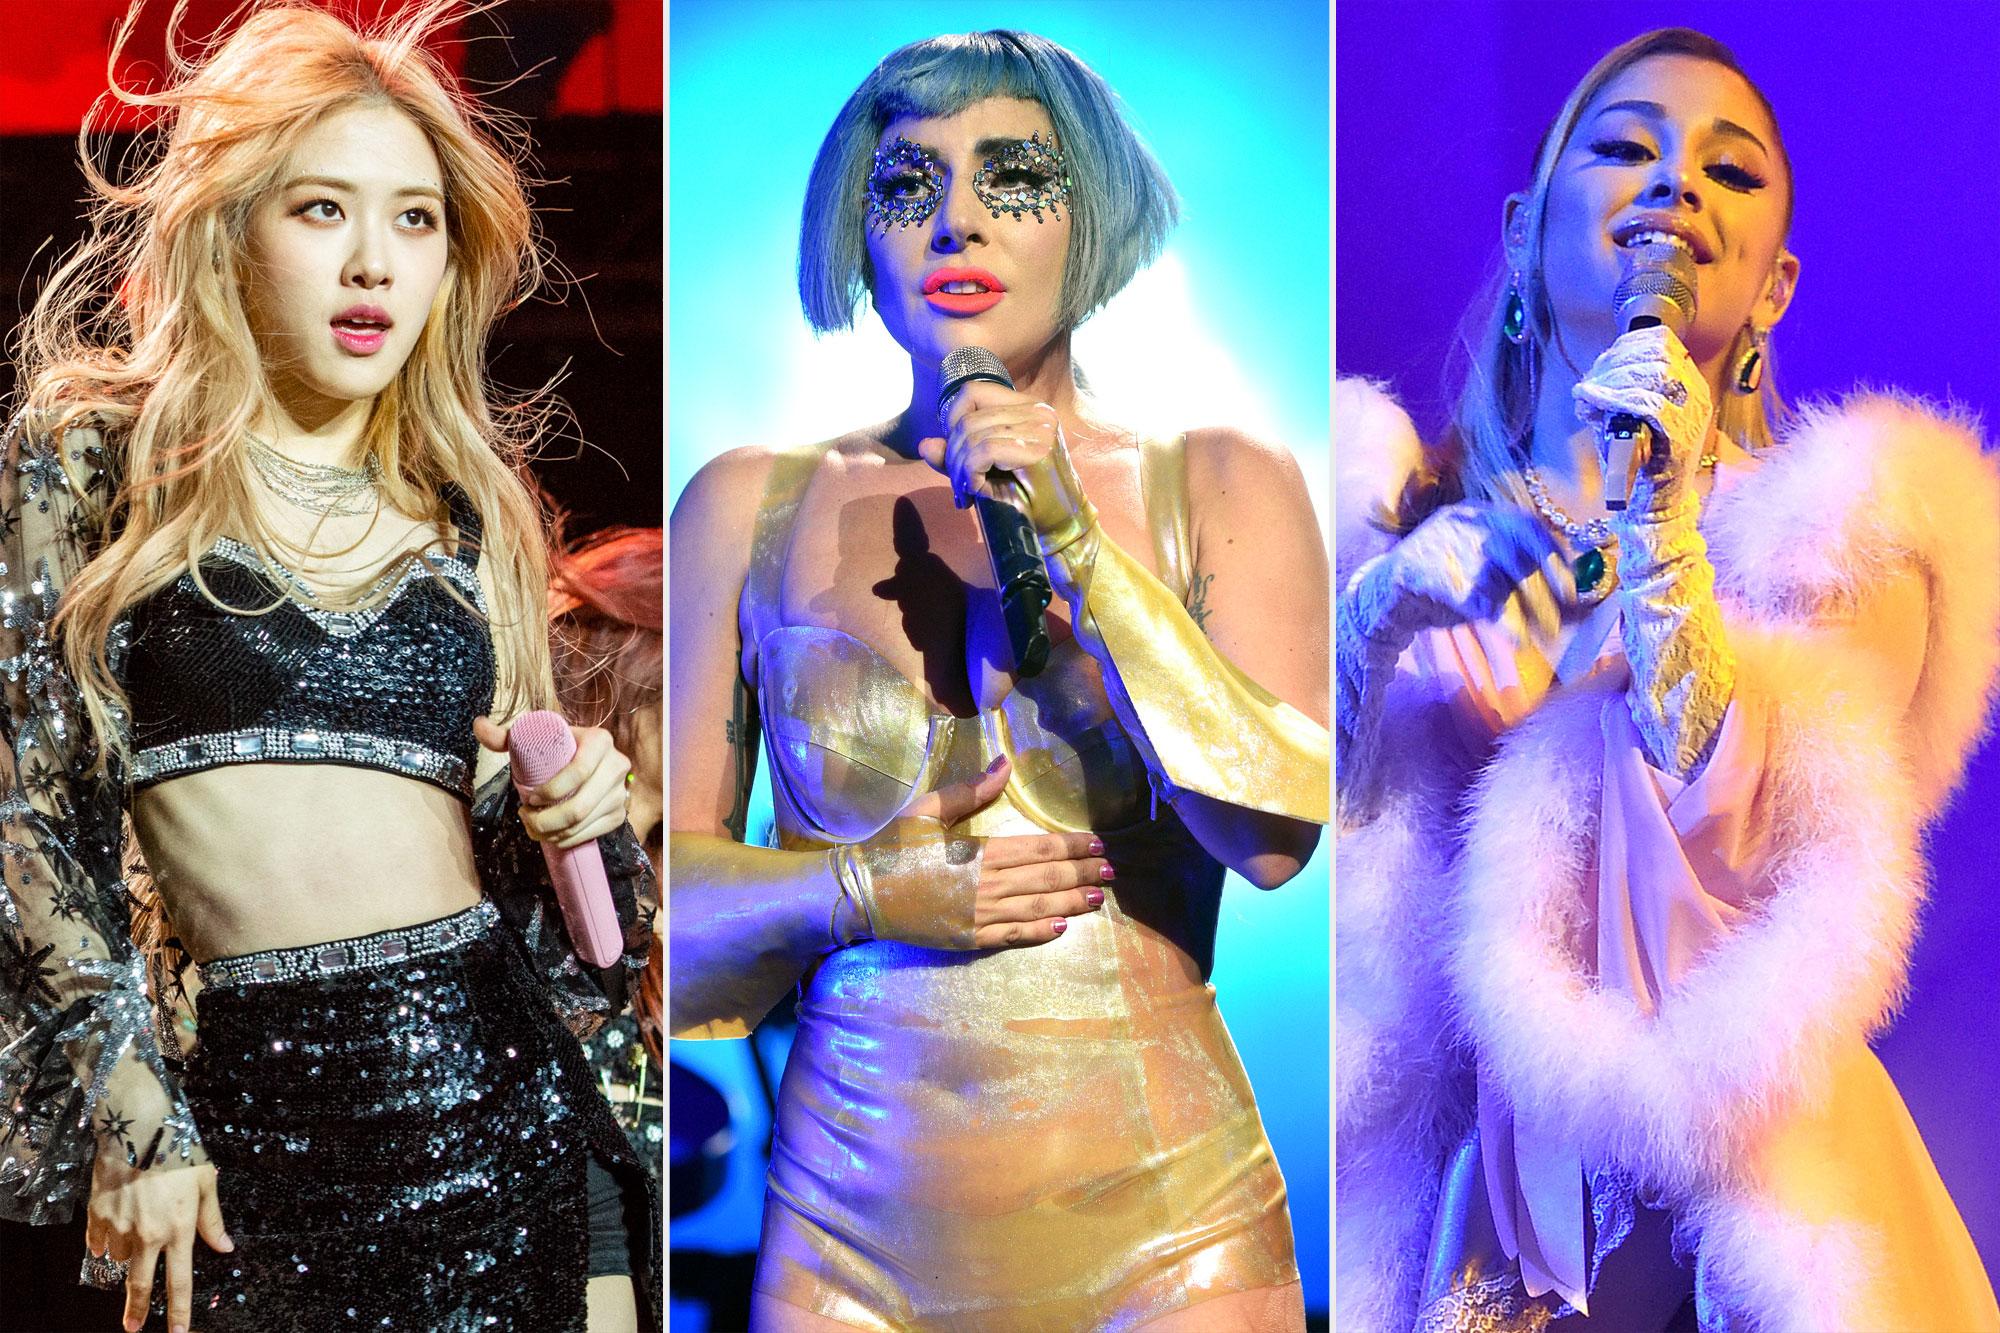 Blackpink/Lady Gaga/Ariana Grande